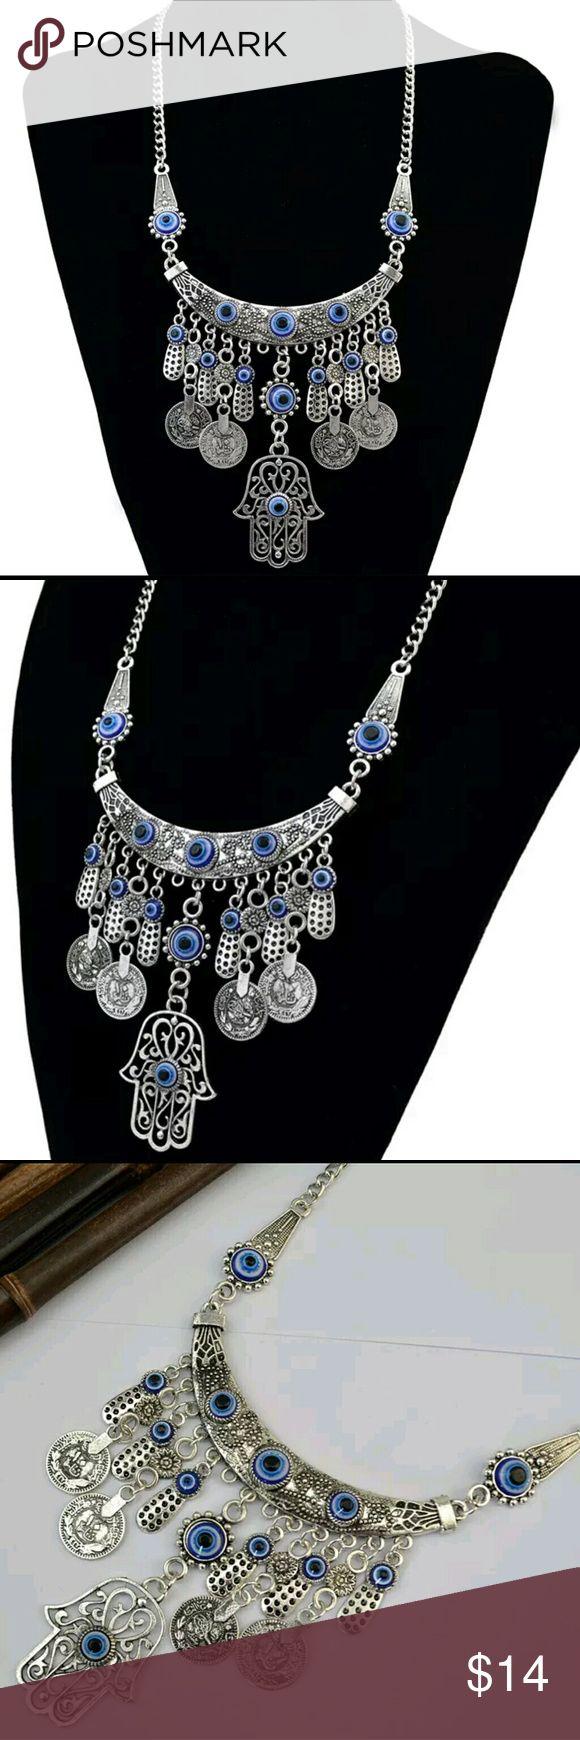 Turkish Eye Necklace - Hamsa Hand Necklace Beautiful Eye Protection Necklace Hamsa Hand Necklace  Coin Necklace Jewelry Necklaces